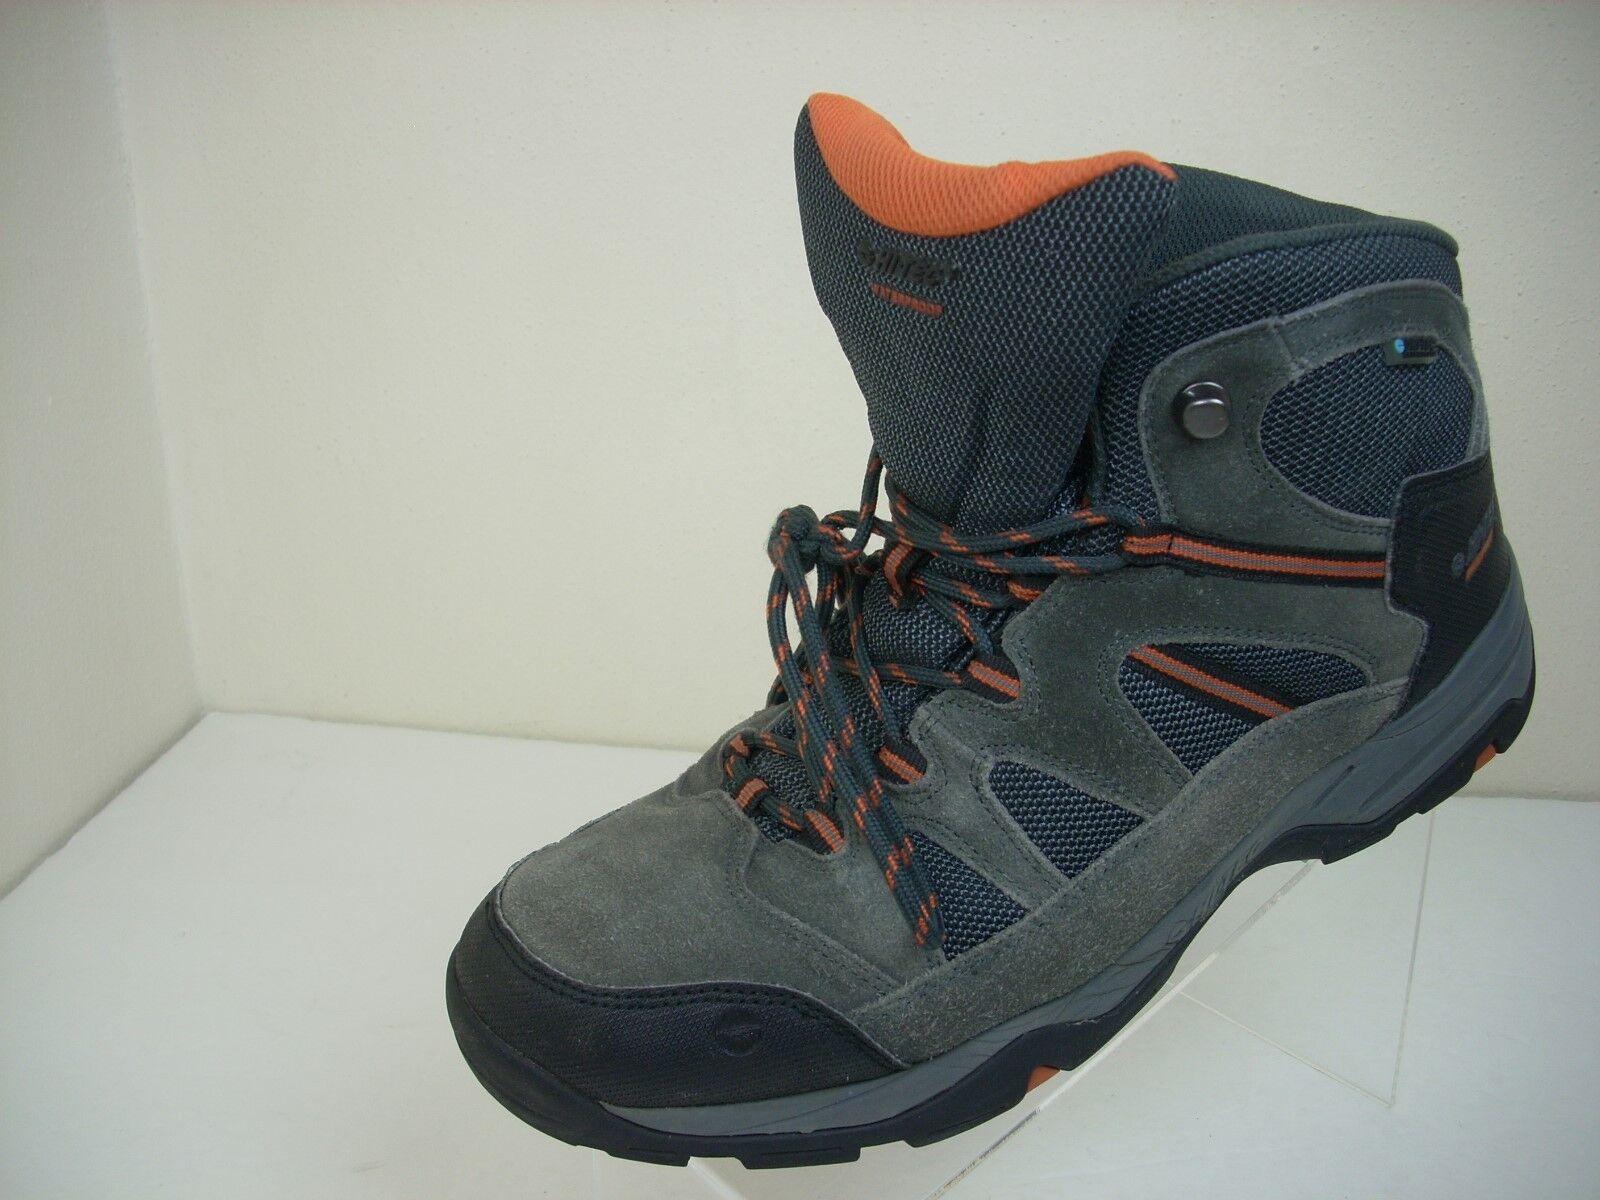 HI-TEC Bandera  Boots 10.5 Gray Waterproof Outdoor Hiking Trail Work Men Suede